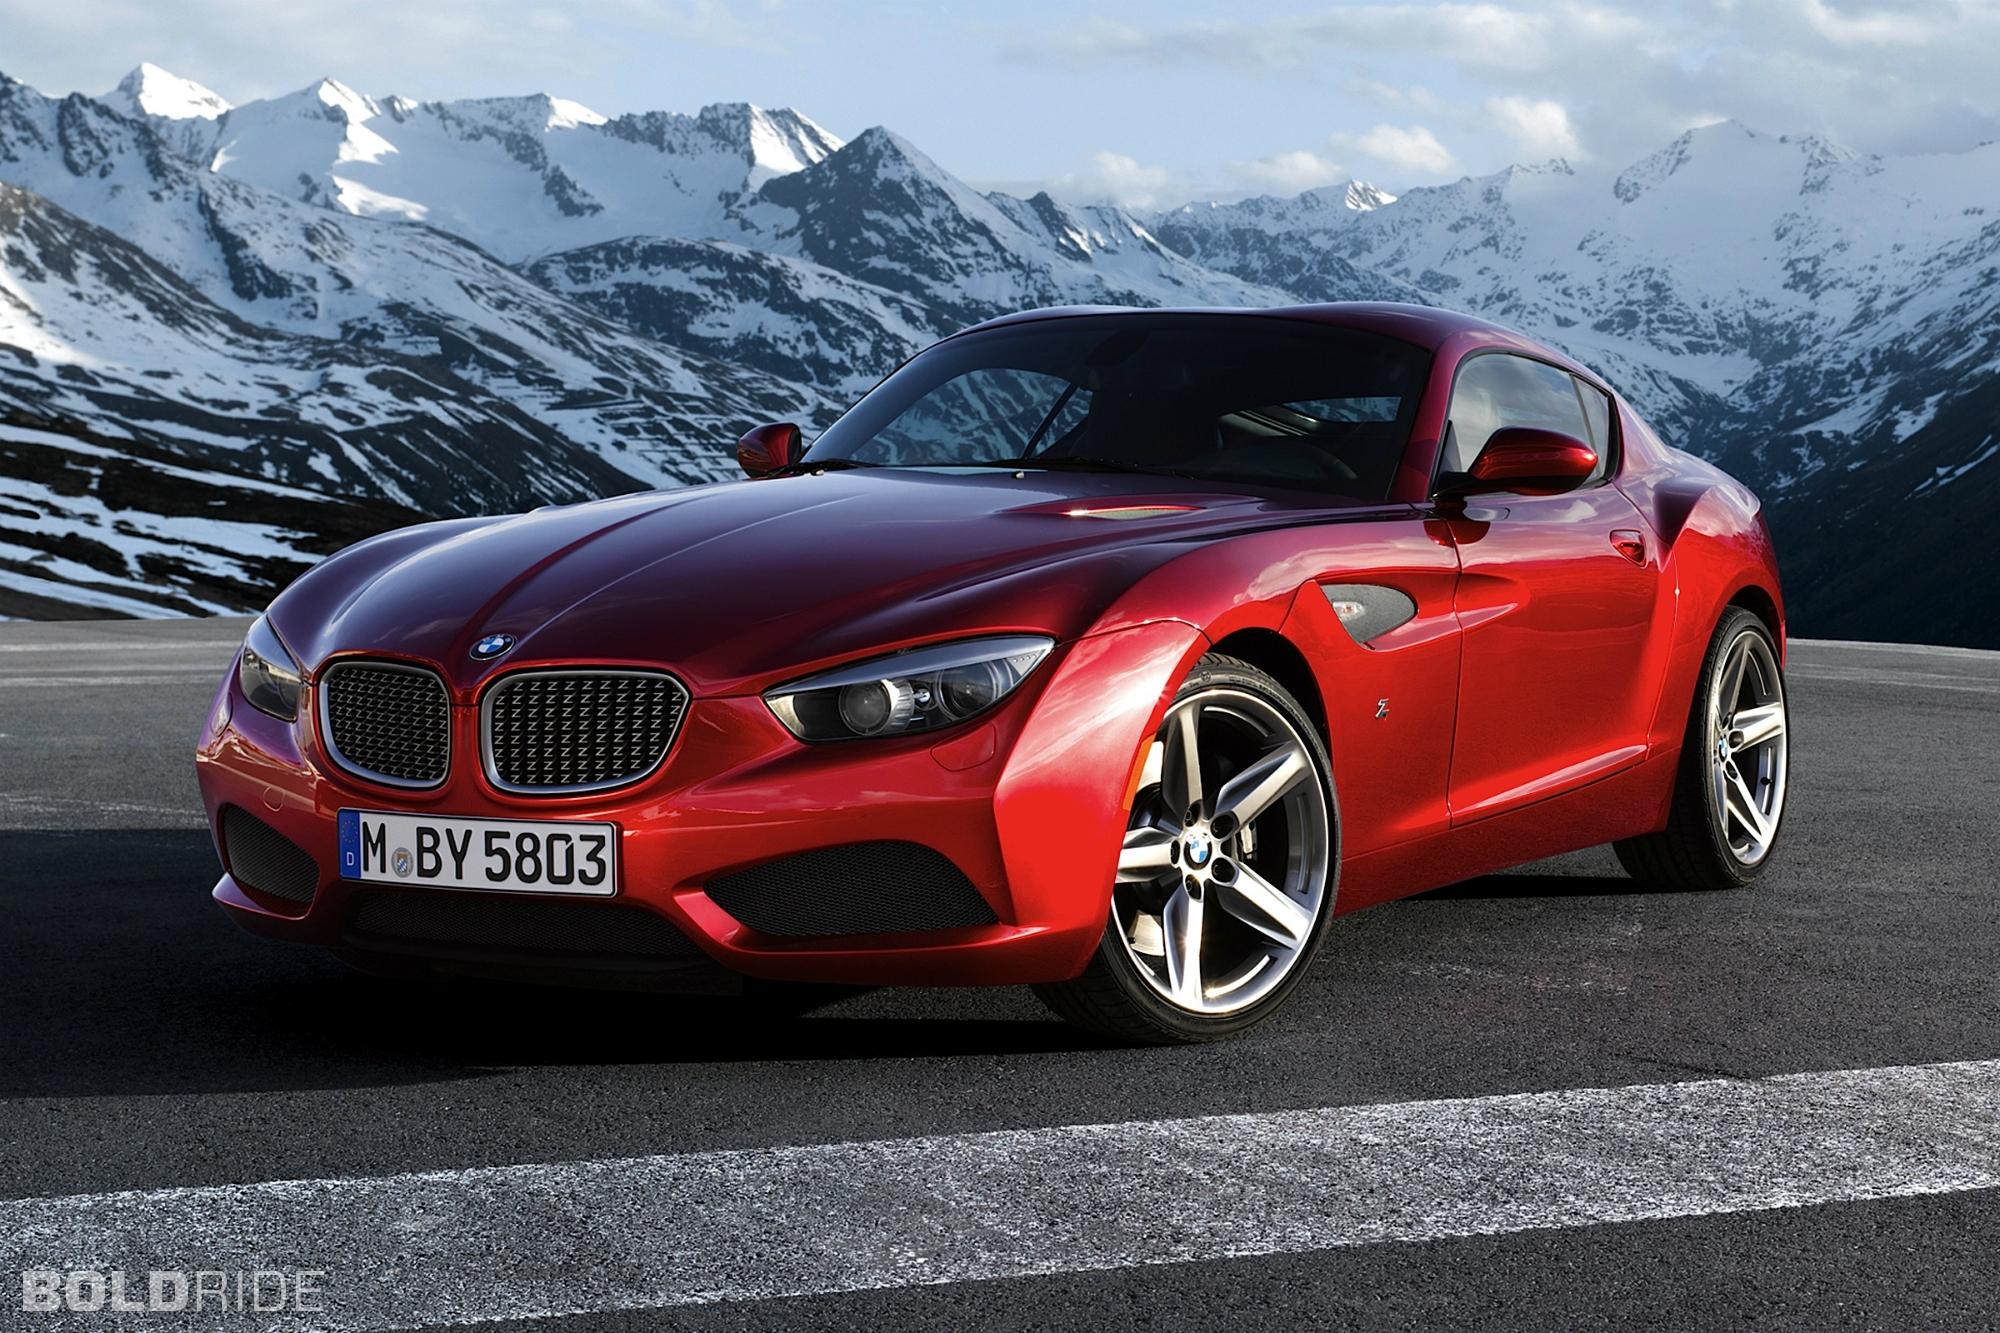 2012 BMW Zagato Coupe 1024 x 770